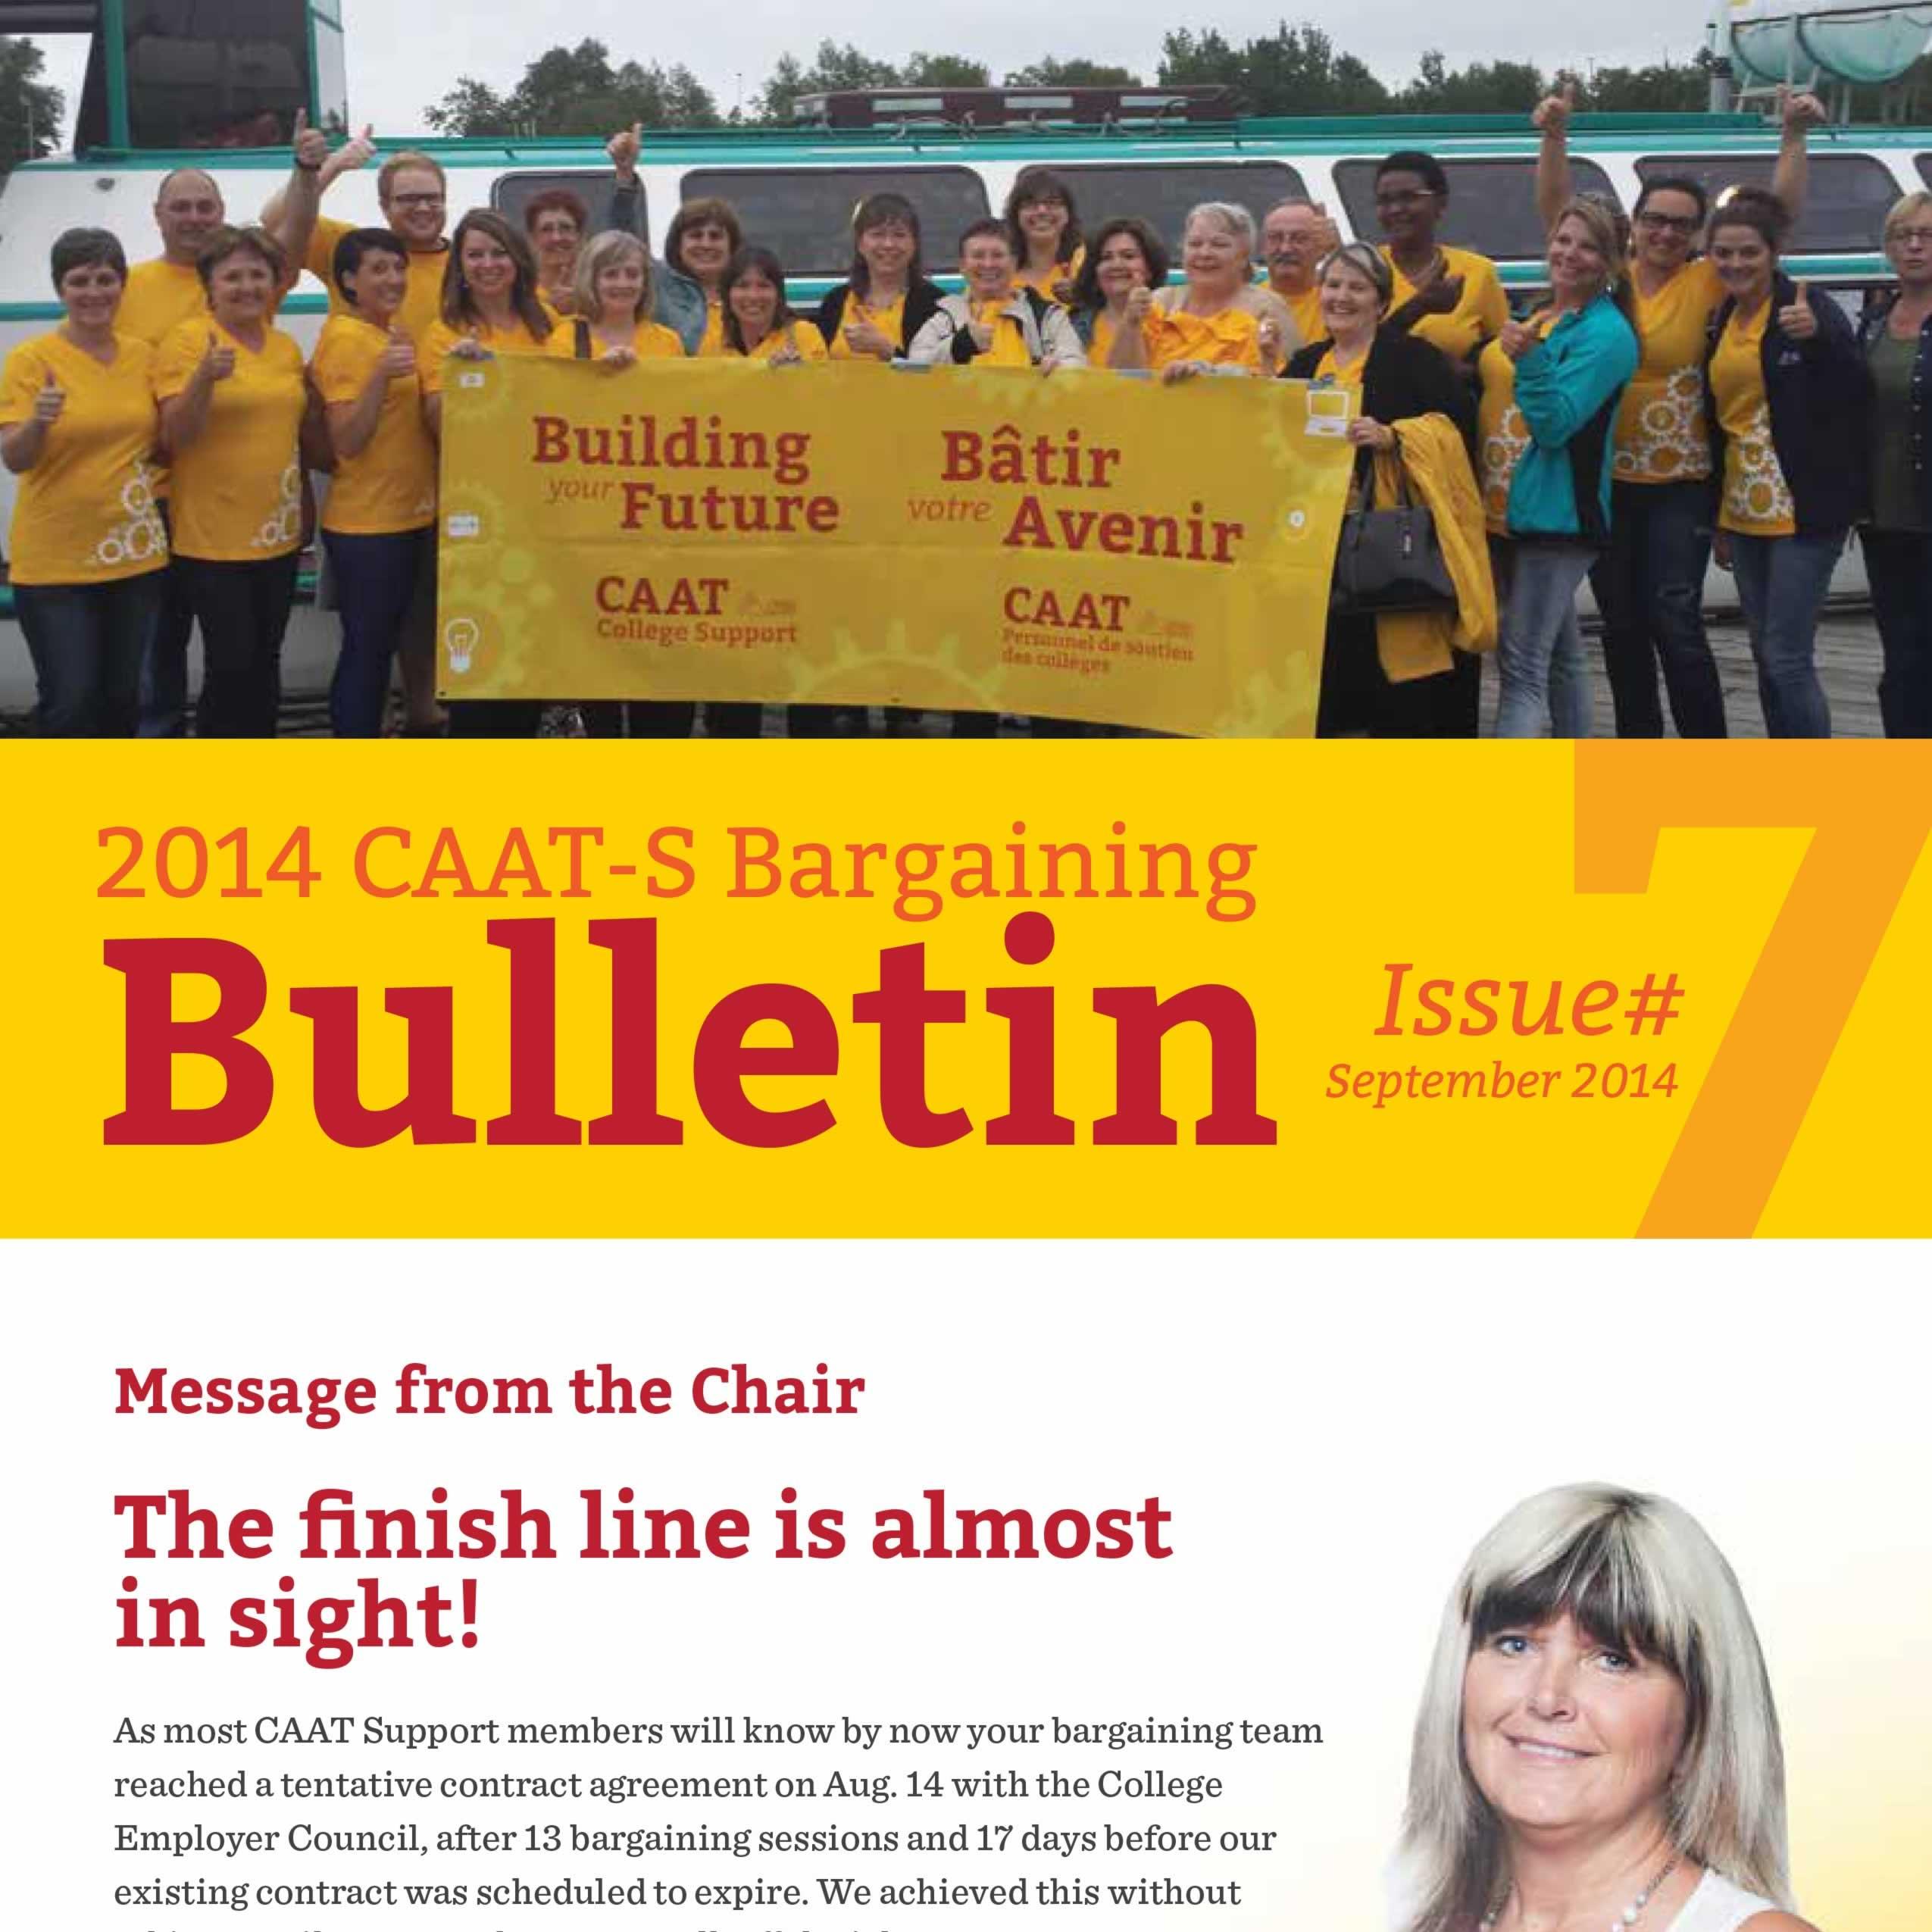 2014 CAAT-S Bargaining Bulletin Issue 7